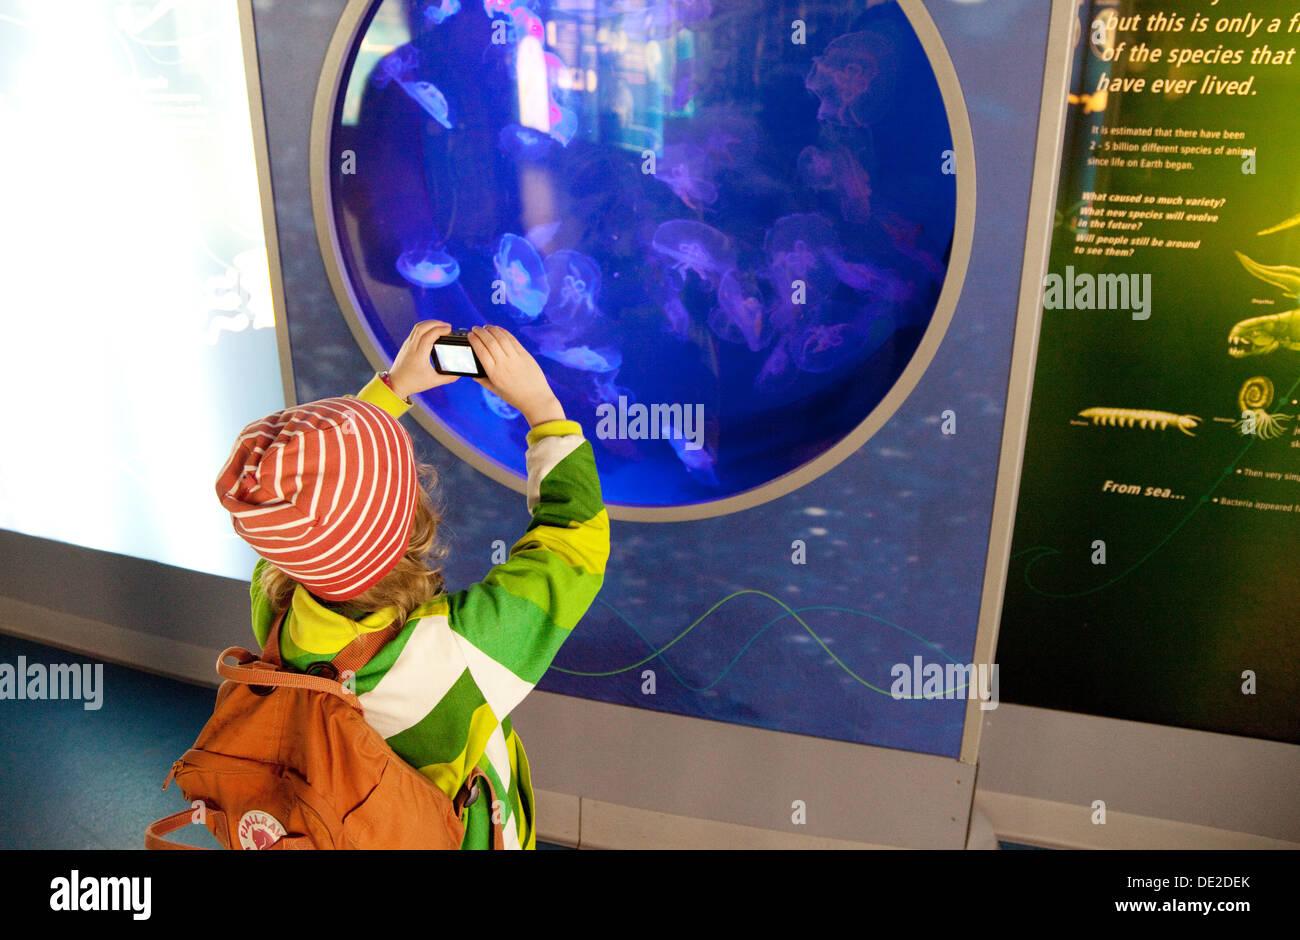 A child taking a photo of jellyfish, London zoo aquarium, London UK - Stock Image